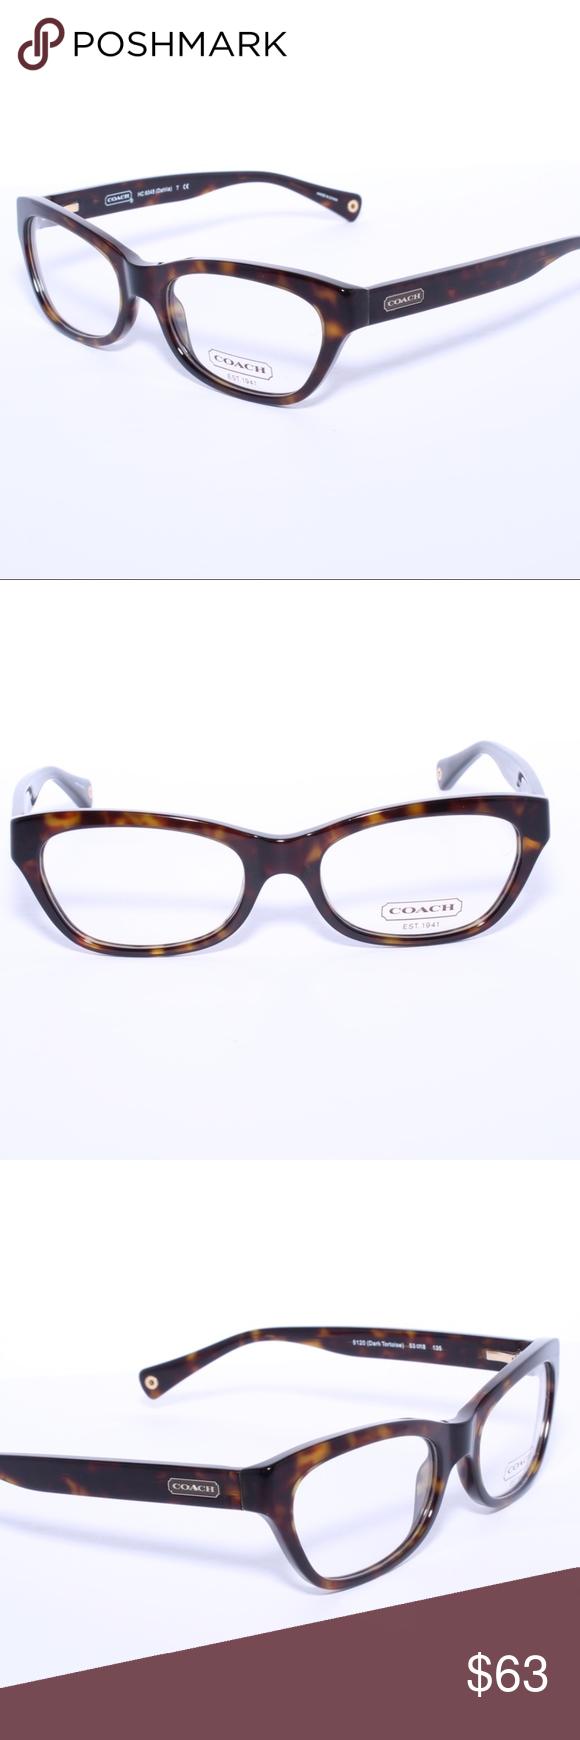 COACH HC 6045 5120 Dahlia Eyeglasses Optical Frame Brand New 100% Authentic COACH HC 6045 5120 Dahlia Eyeglasses Optical Frames Glasses Dark Tortoise 53mm Comes with Generic Case, NO Pouch Coach Accessories Glasses